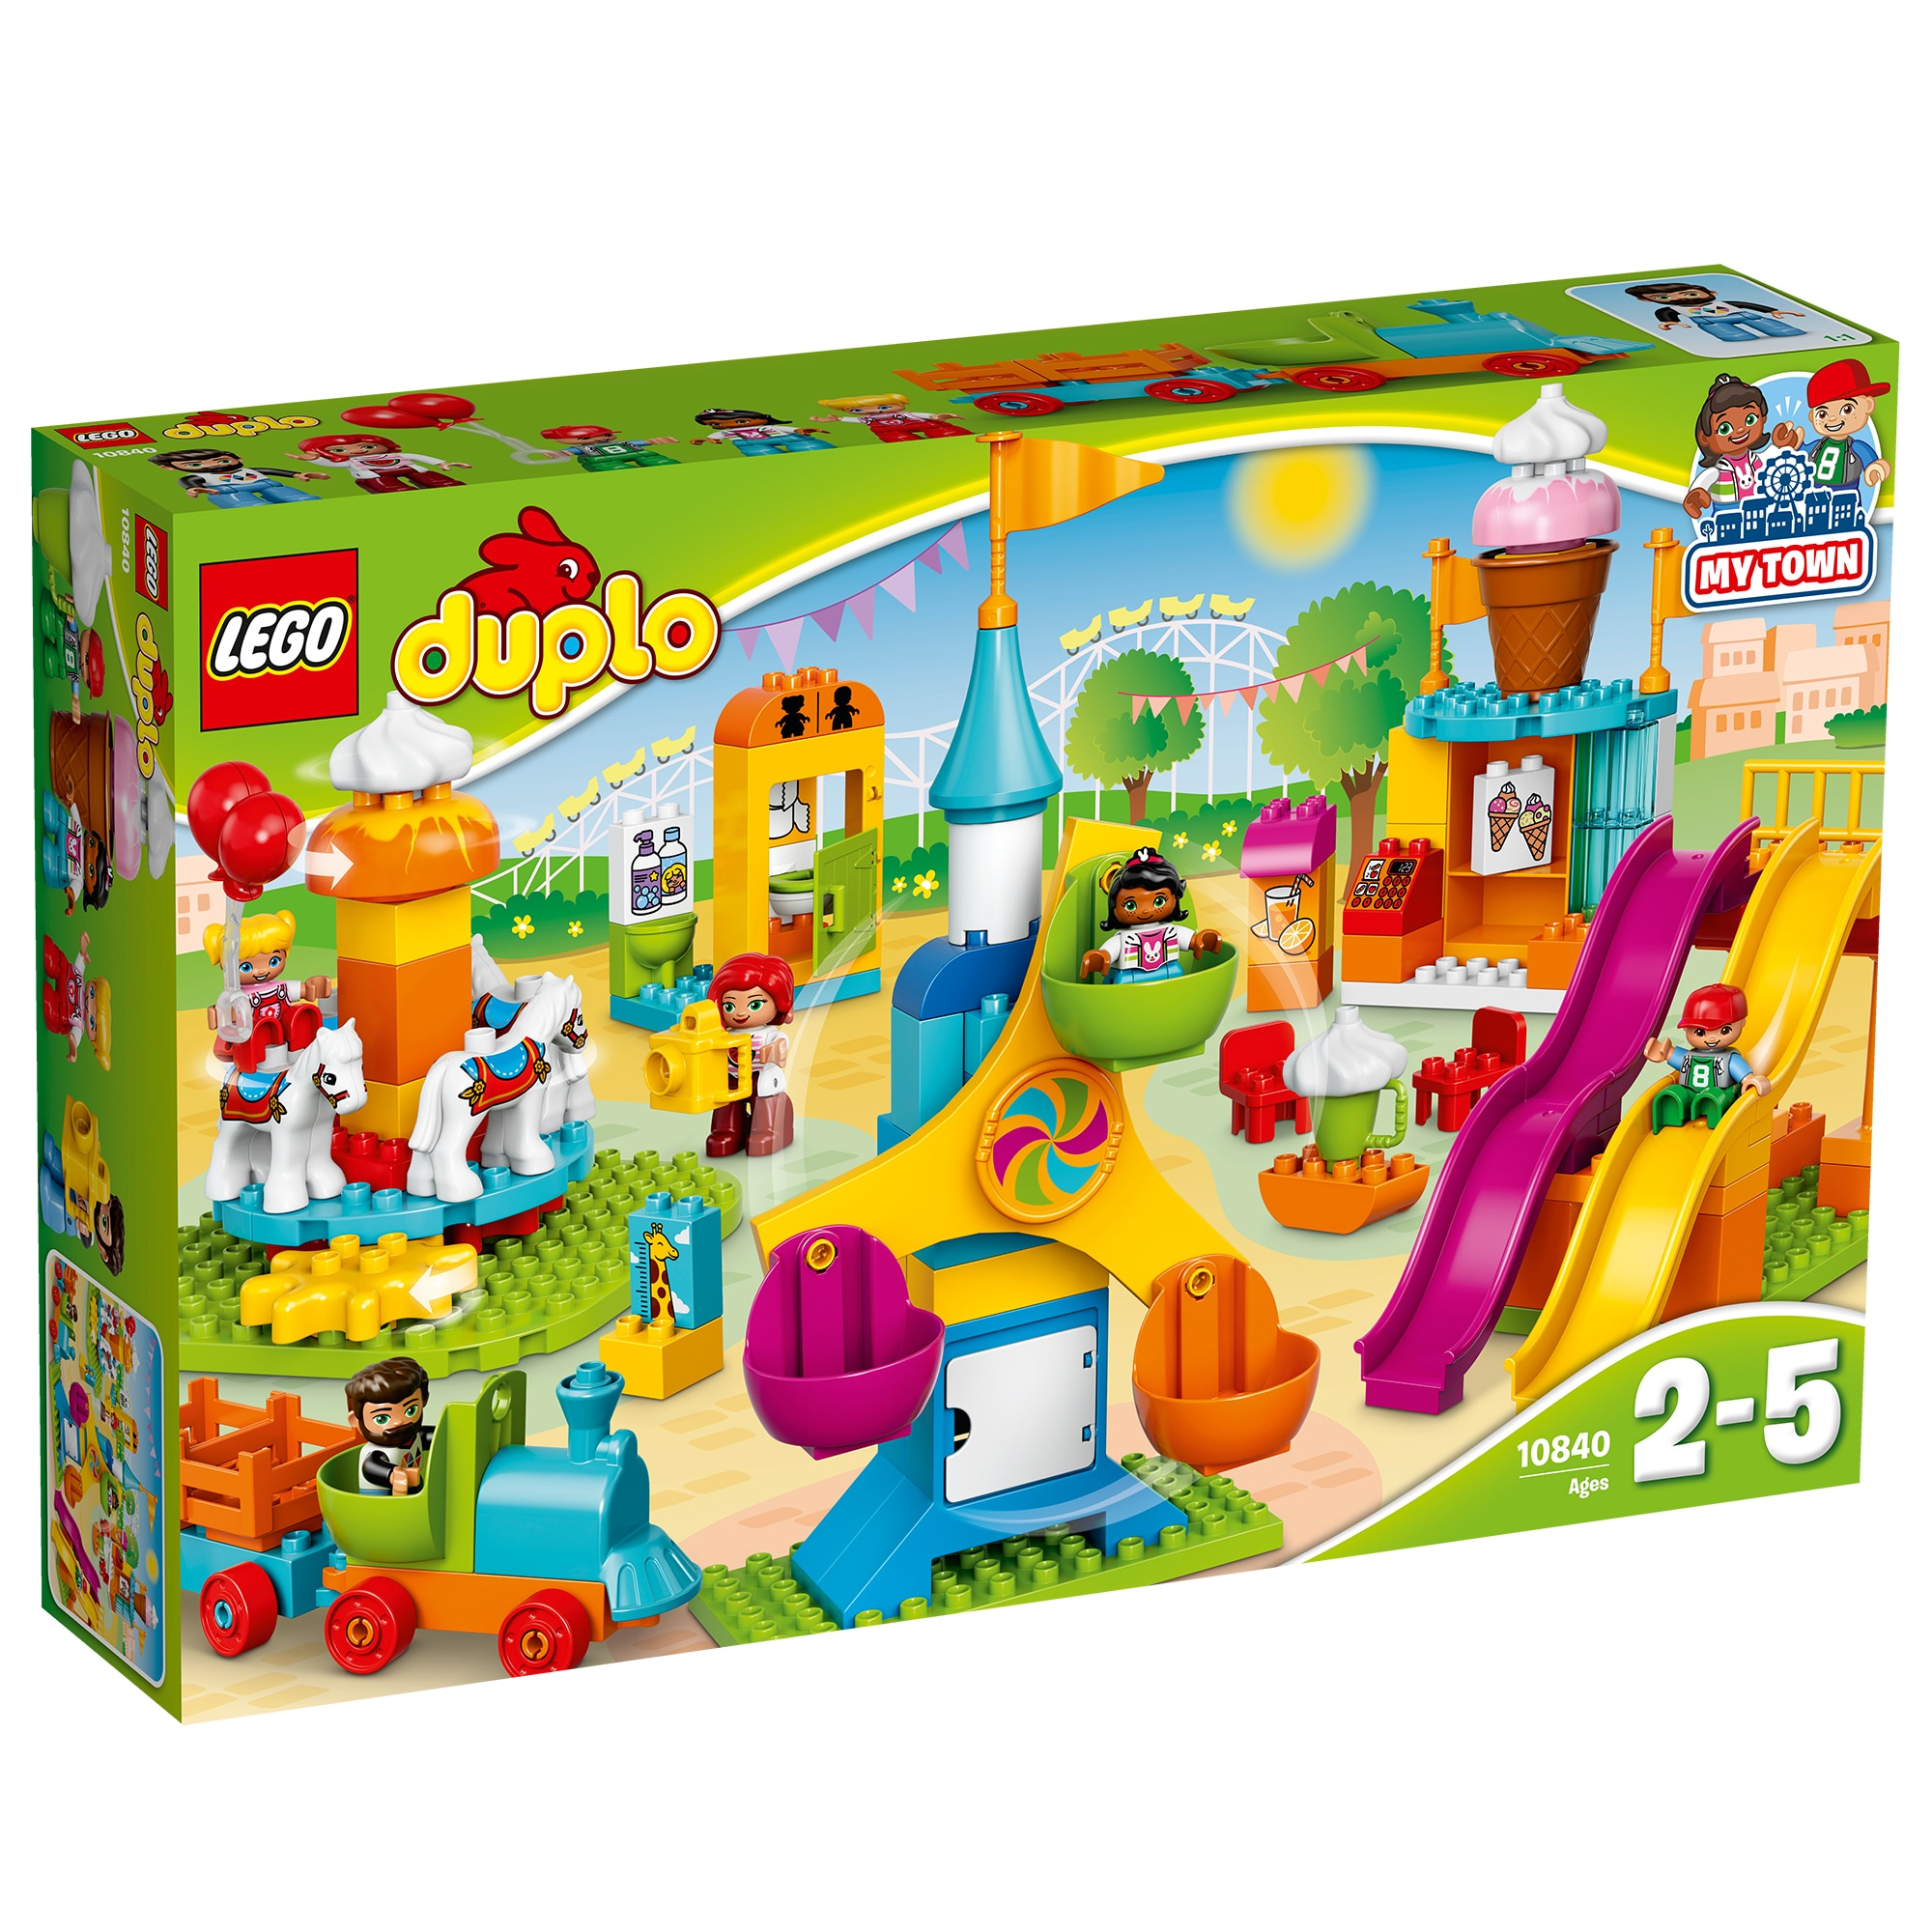 Fotografie LEGO DUPLO - Parc mare de distractii 10840, 106 piese